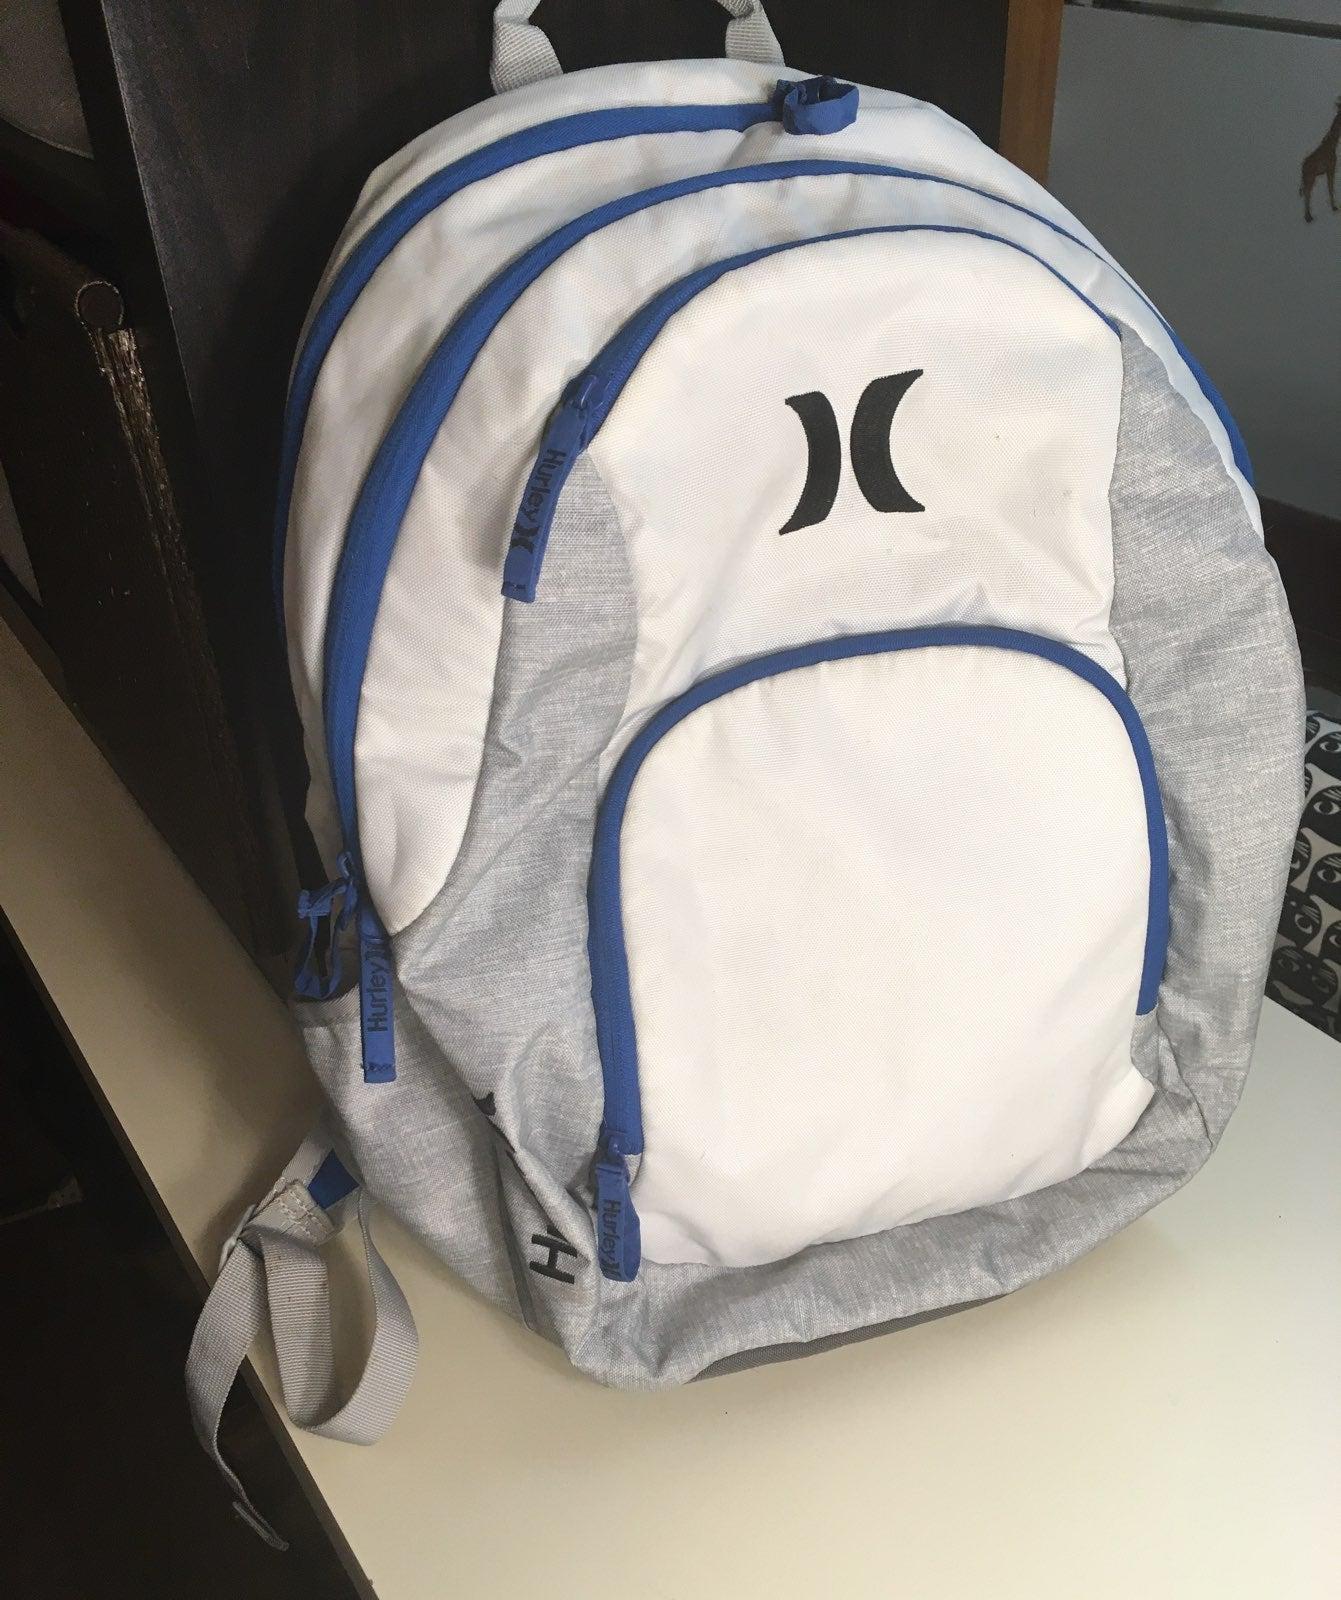 Hurley Buckle Exclusive Backpack Large